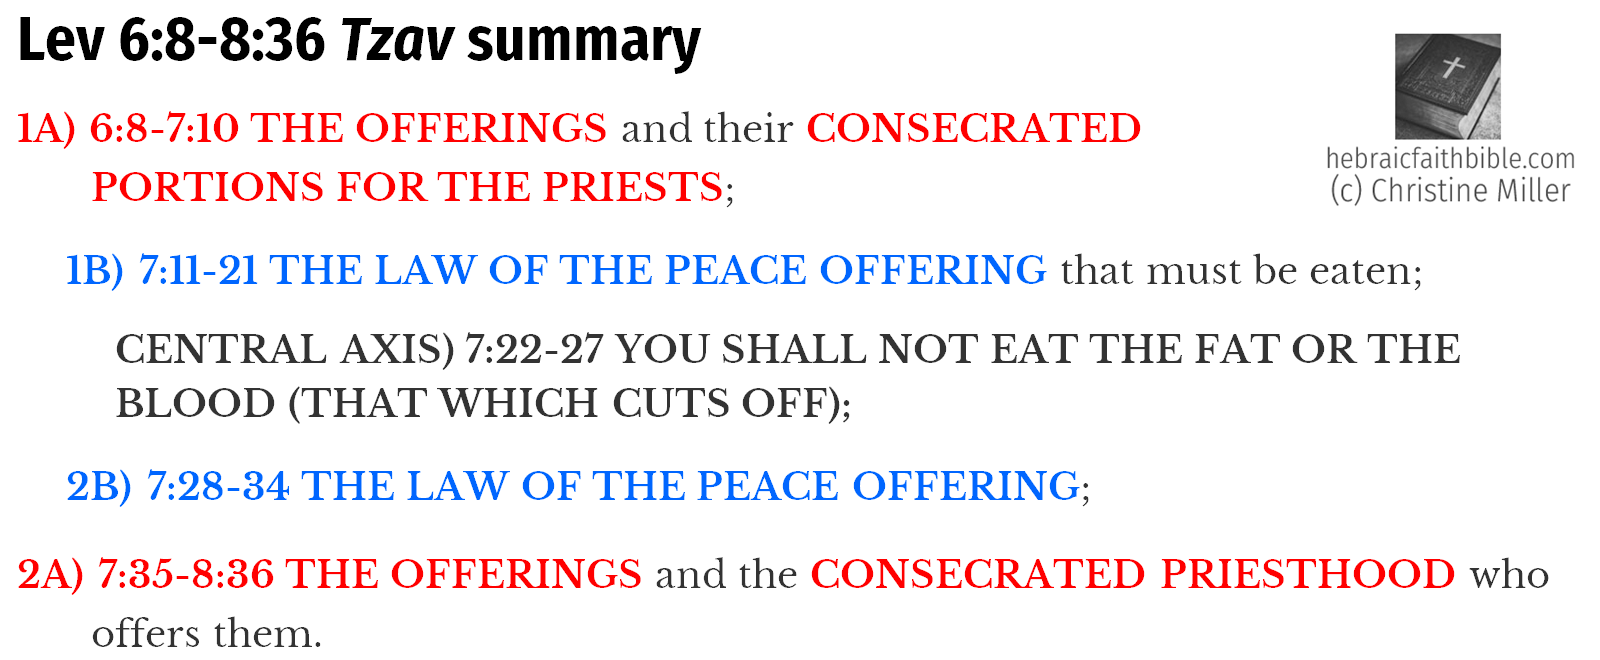 Lev 6:8-8:36 Tzav Chiasm Summary | hebraicfaithbible.com